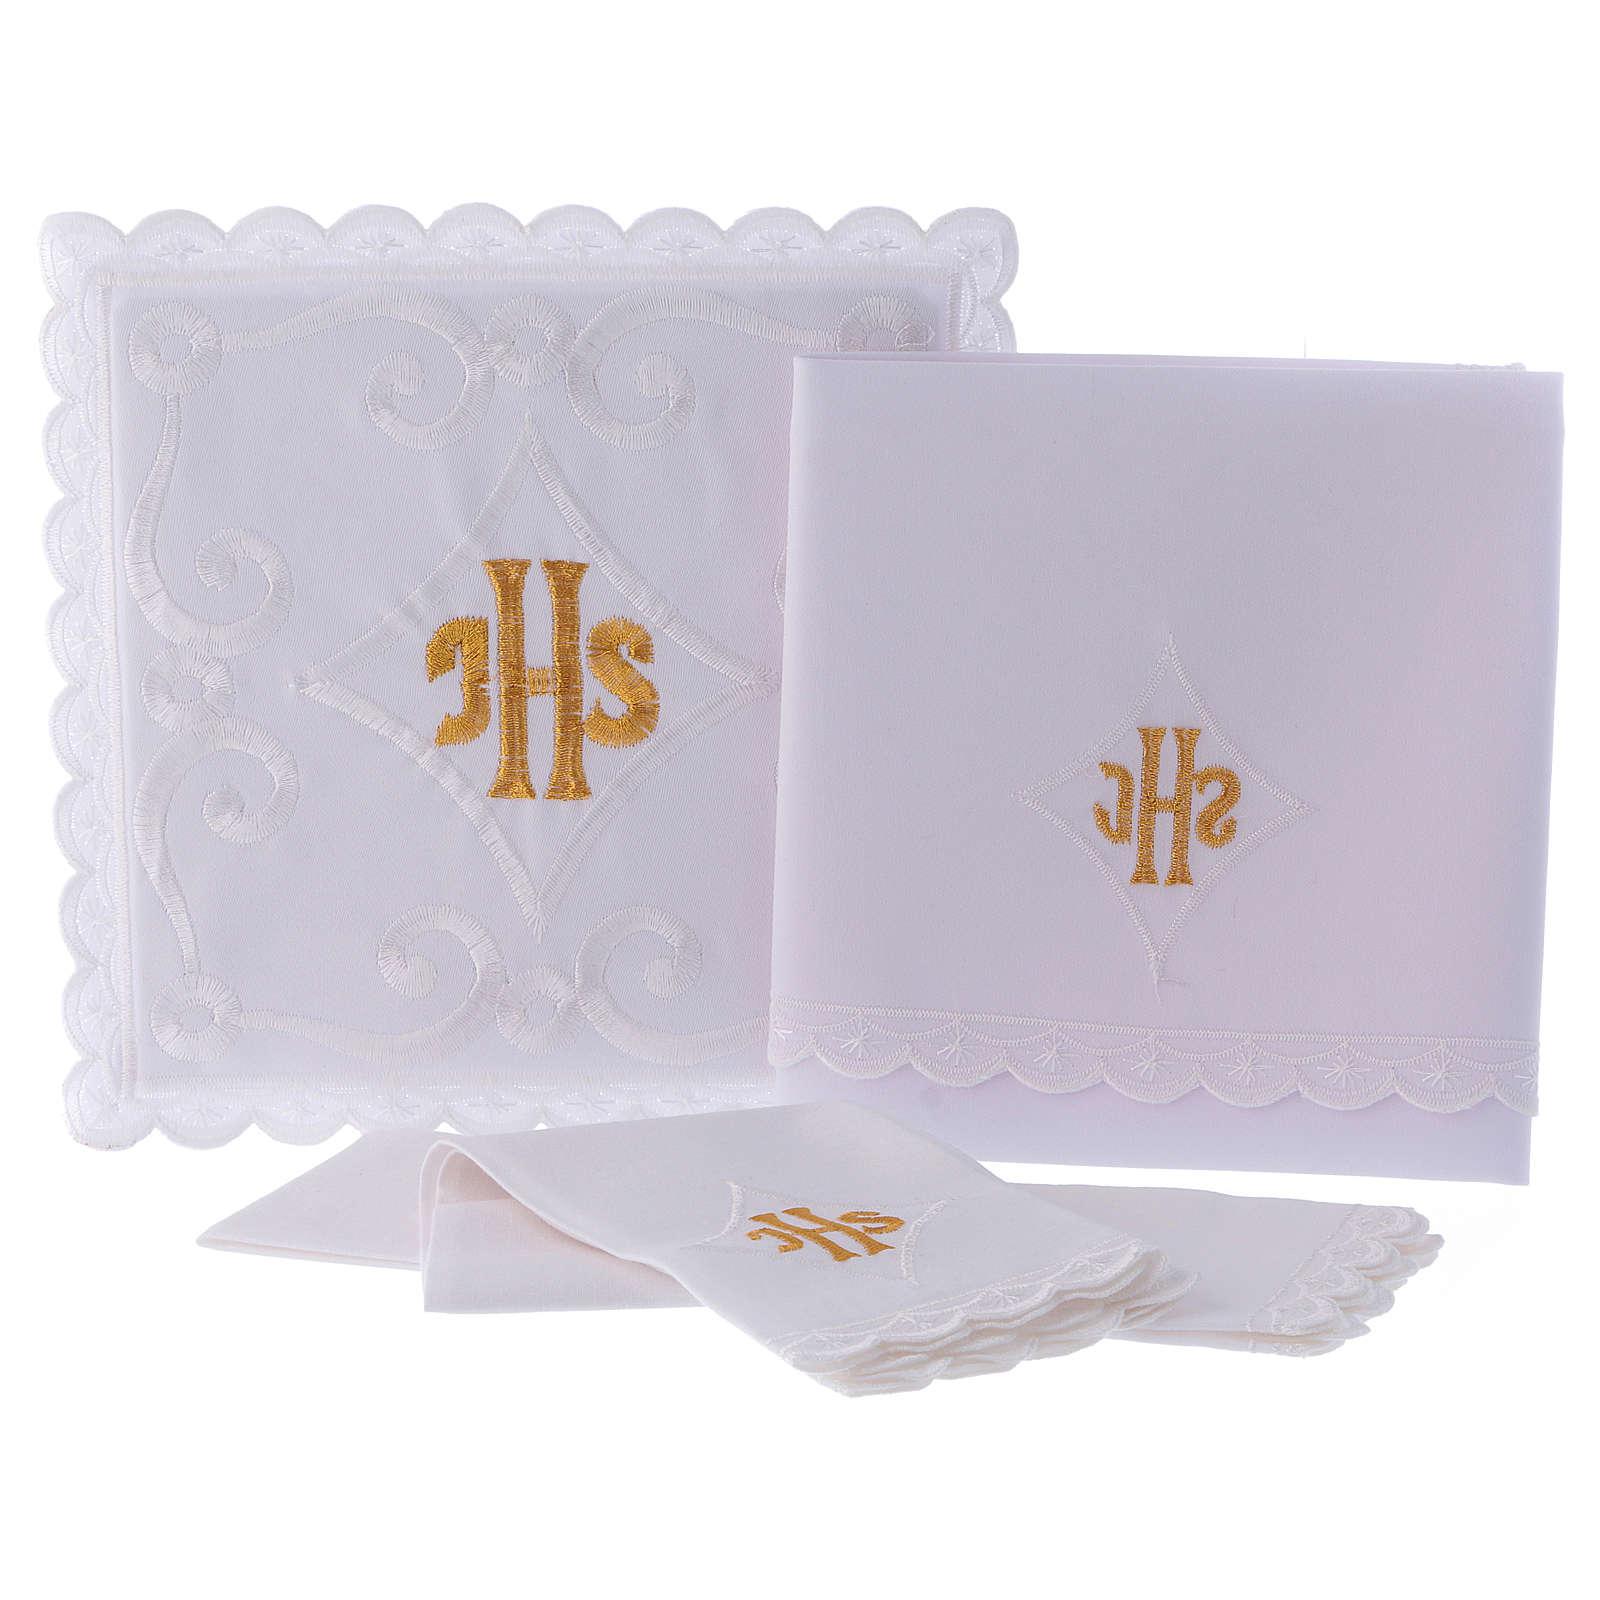 Servicio de altar con escrita IHS oro 4